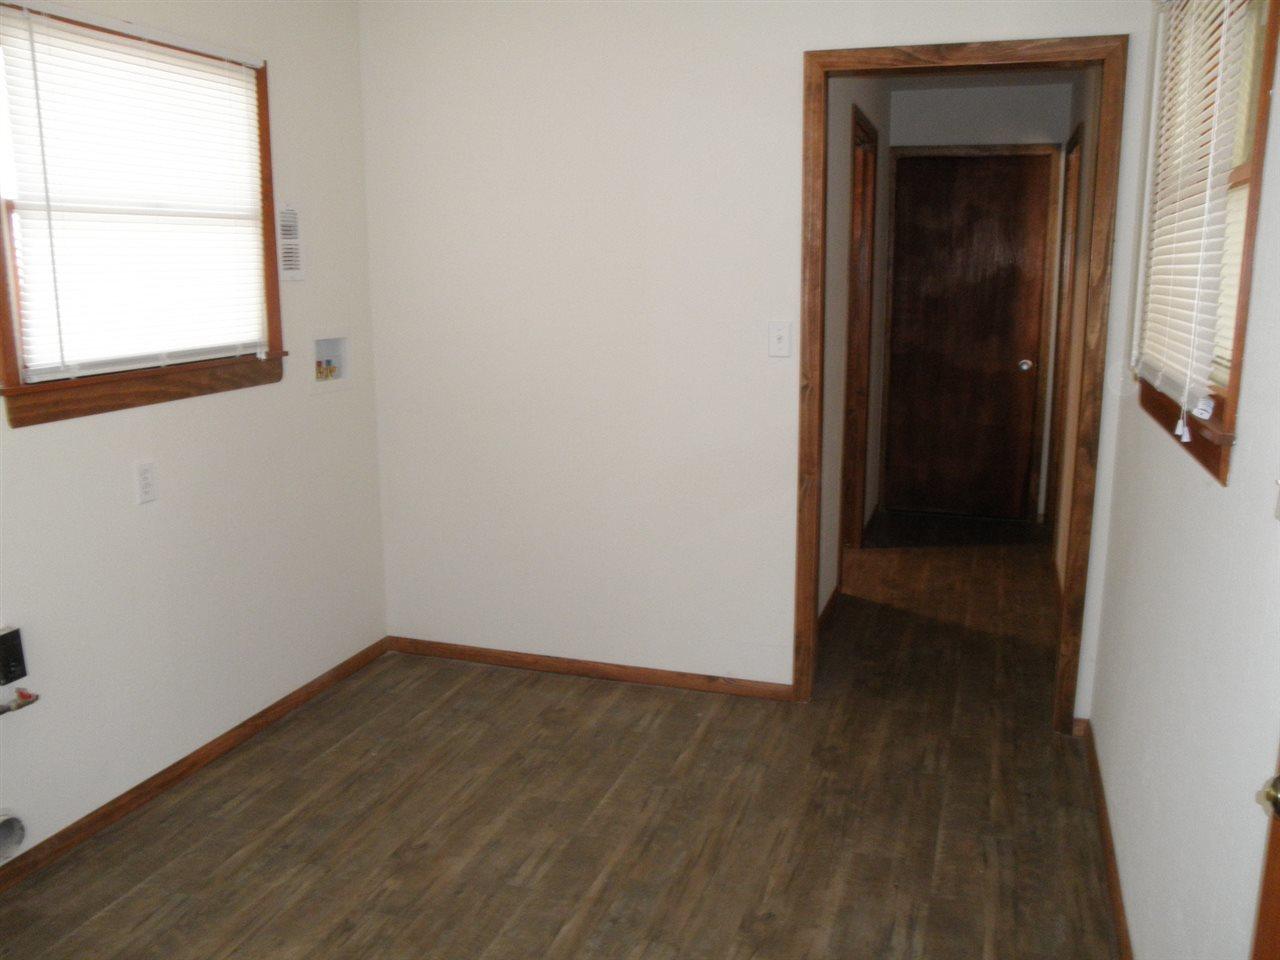 Sold Cross Sale W/ MLS | 204 N 13th  Ponca City, OK 74601 20